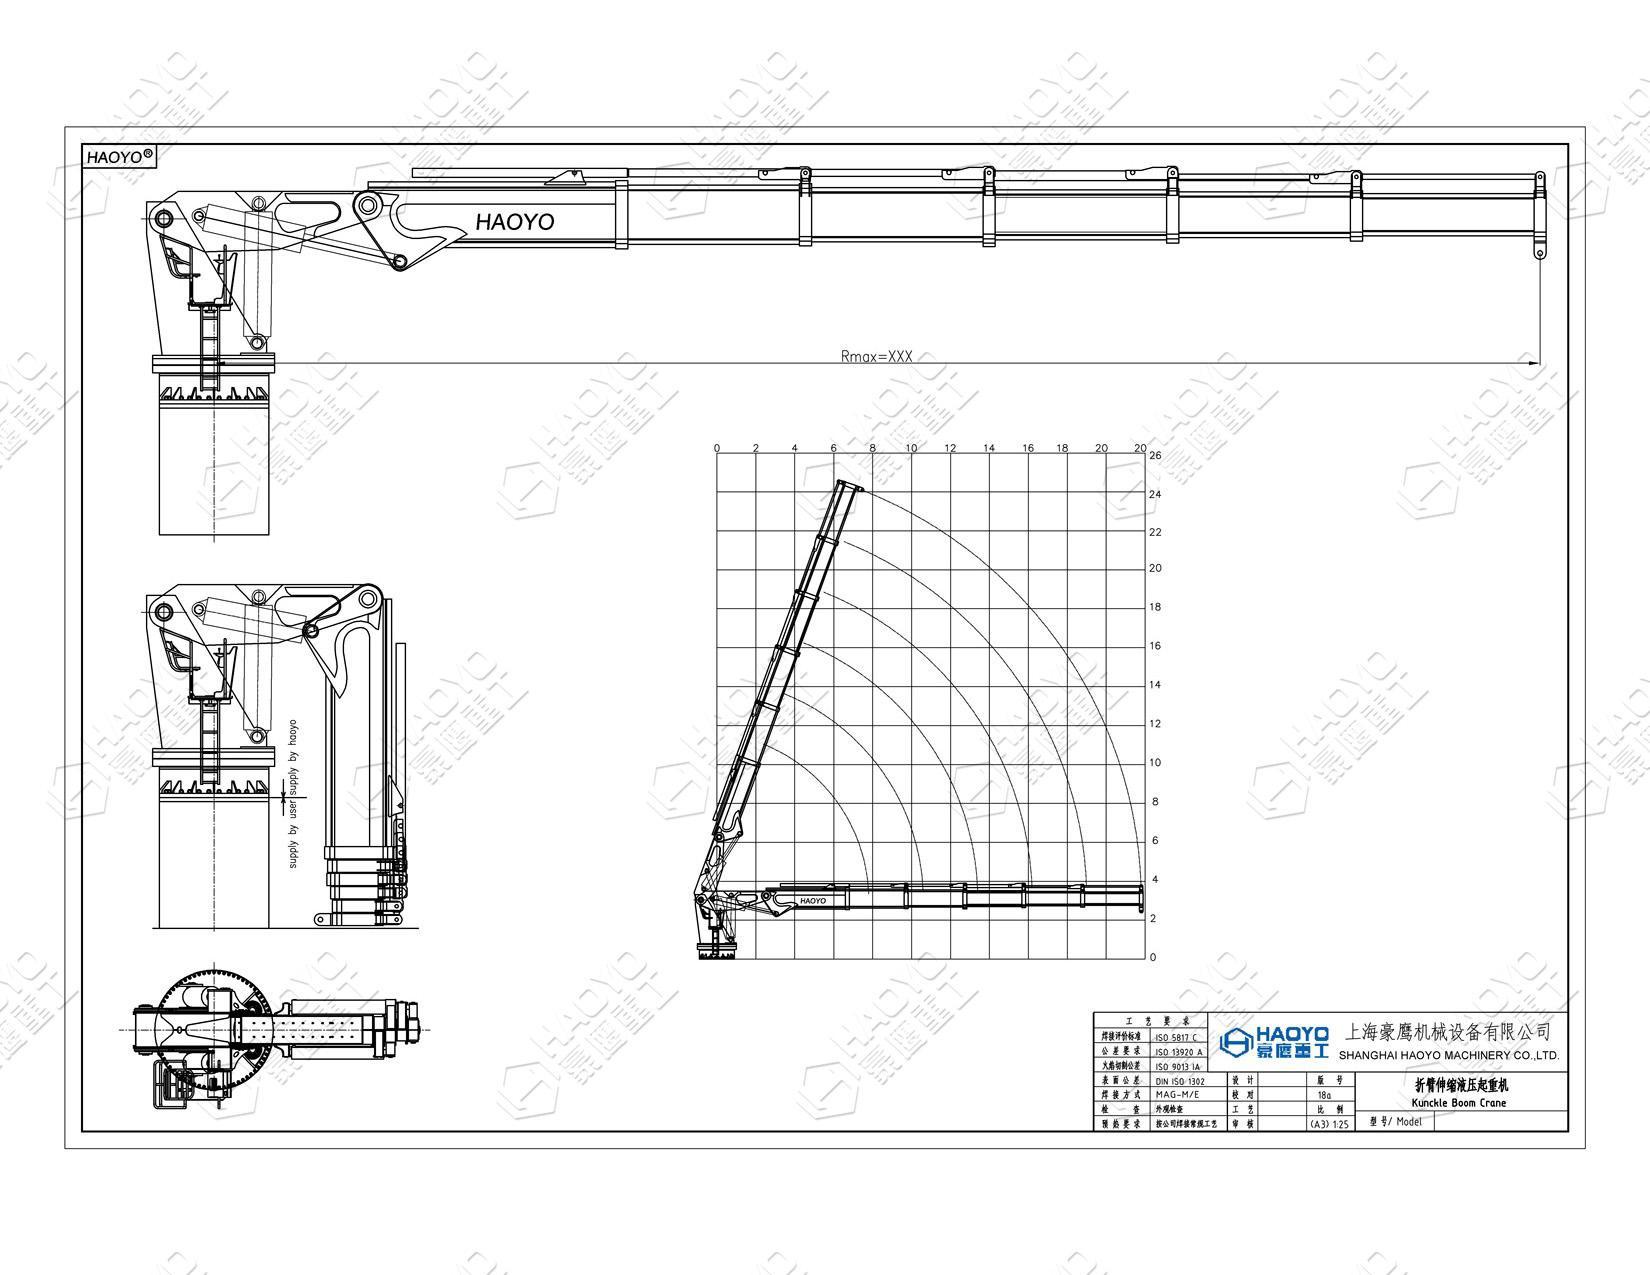 Customized Knuckle Boom Marine Deck Offshore Crane 5